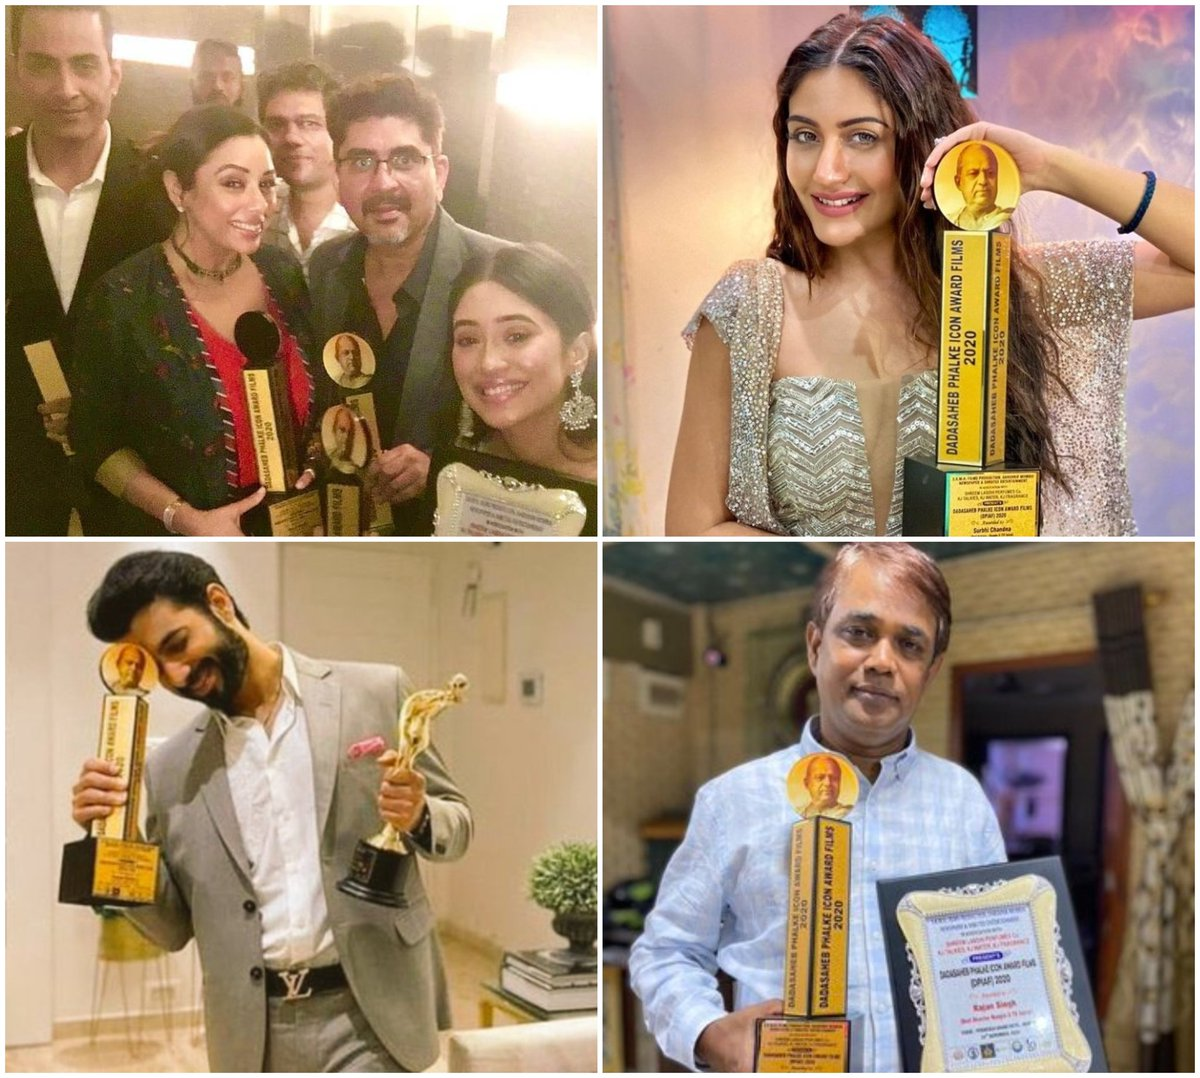 Best Actress -#SurbhiChandna Best Actor -#SharadMalhotra Best Director - #Naagin5 Best Jodi - #Kaira #ShivangiJoshi - #MohsinKhan Adaa Khan, Arjun Bijlani also won award at #DadaSahebPhalkeAwards 2020 #SharadMalhotra #VAni  #YRKKH #AdaaKhan #ArjunBijlani #anupama  Writer: Twitter https://t.co/Kqa0R9ugBg